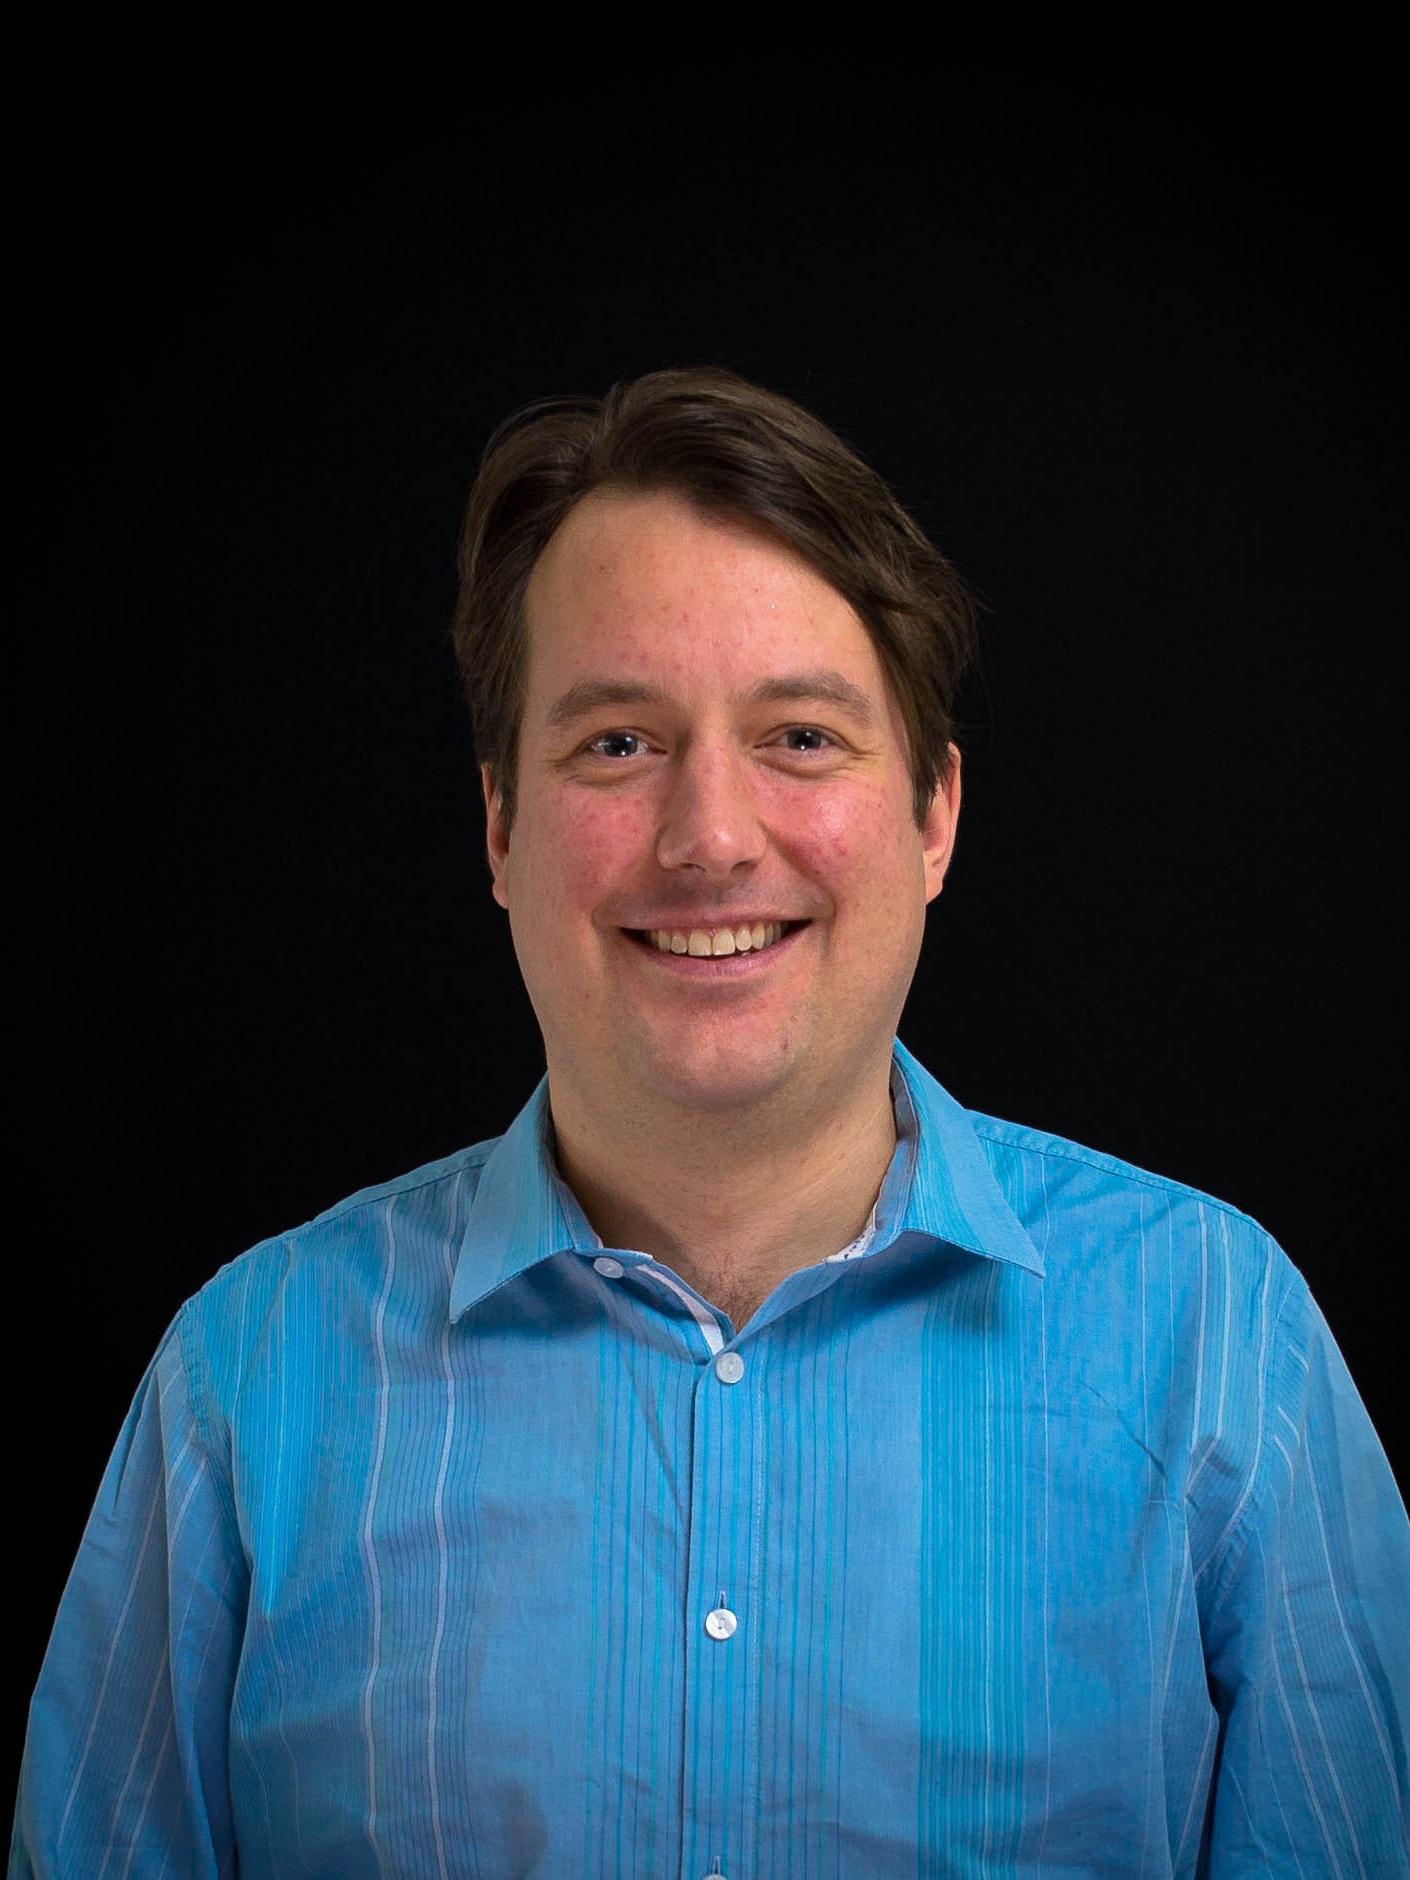 Chad Vecitis, Ph.D. - CTO and CoFounder